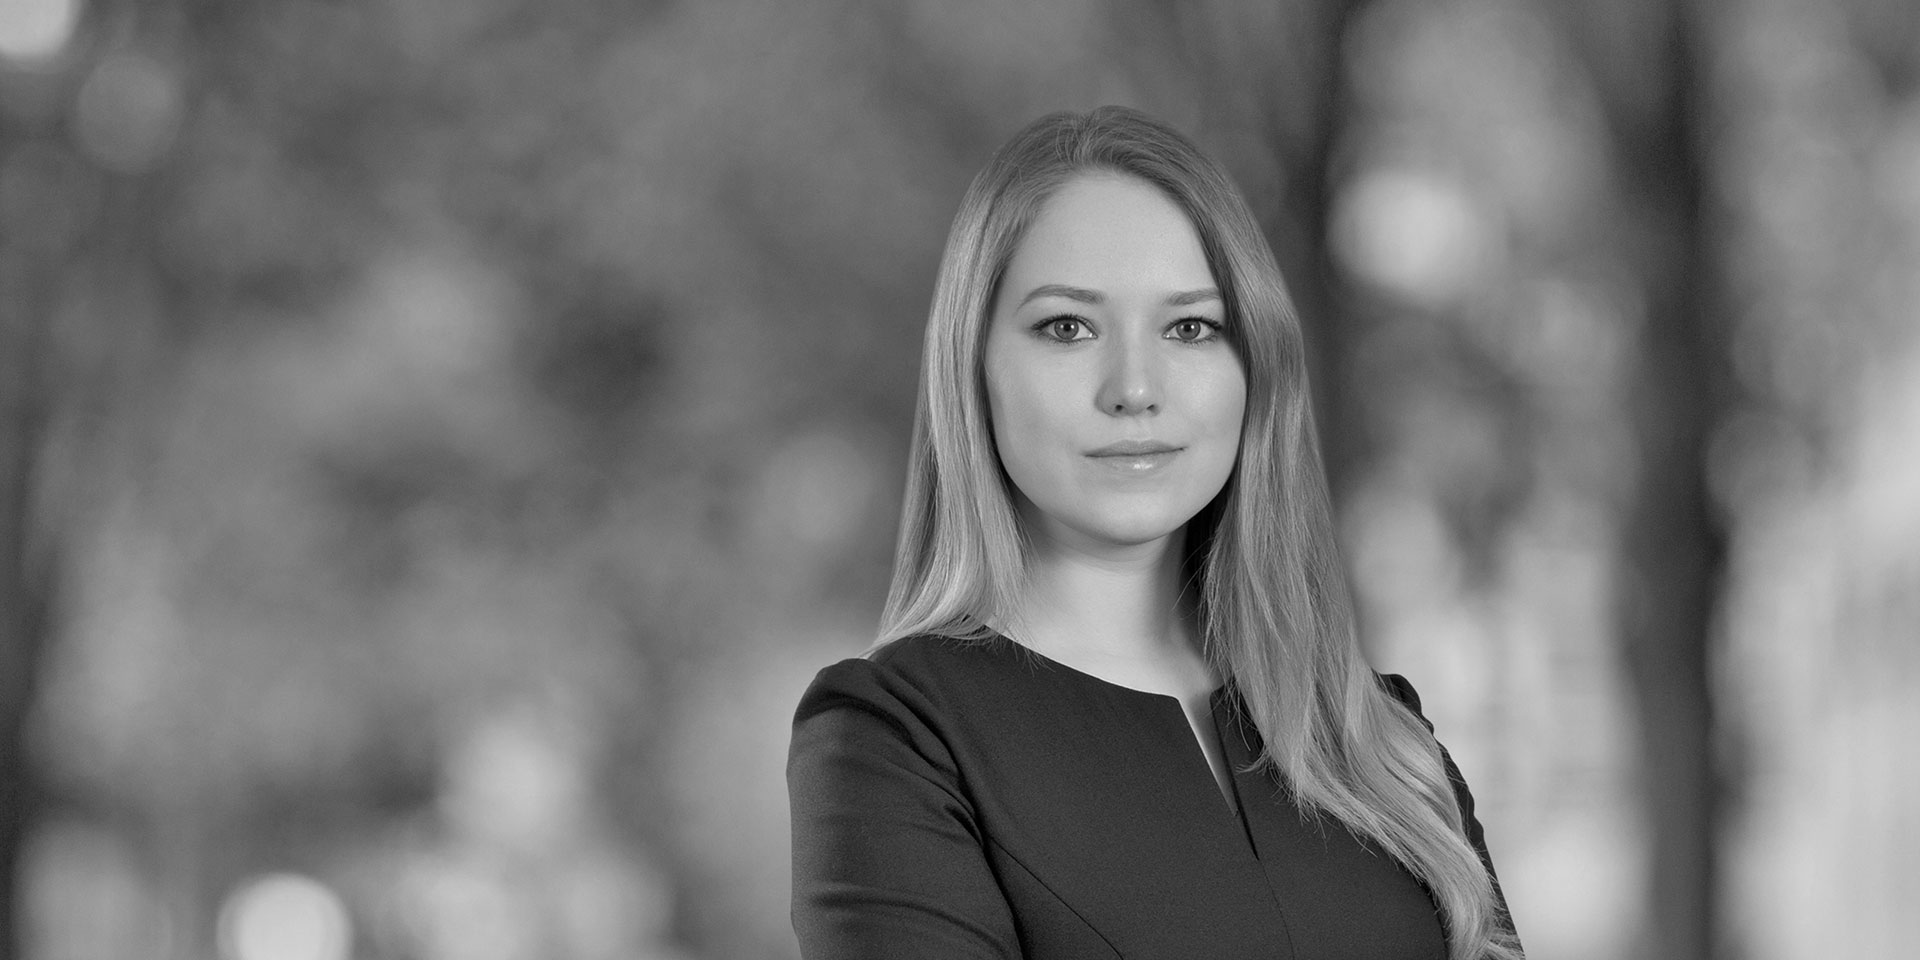 Yulia Petelina